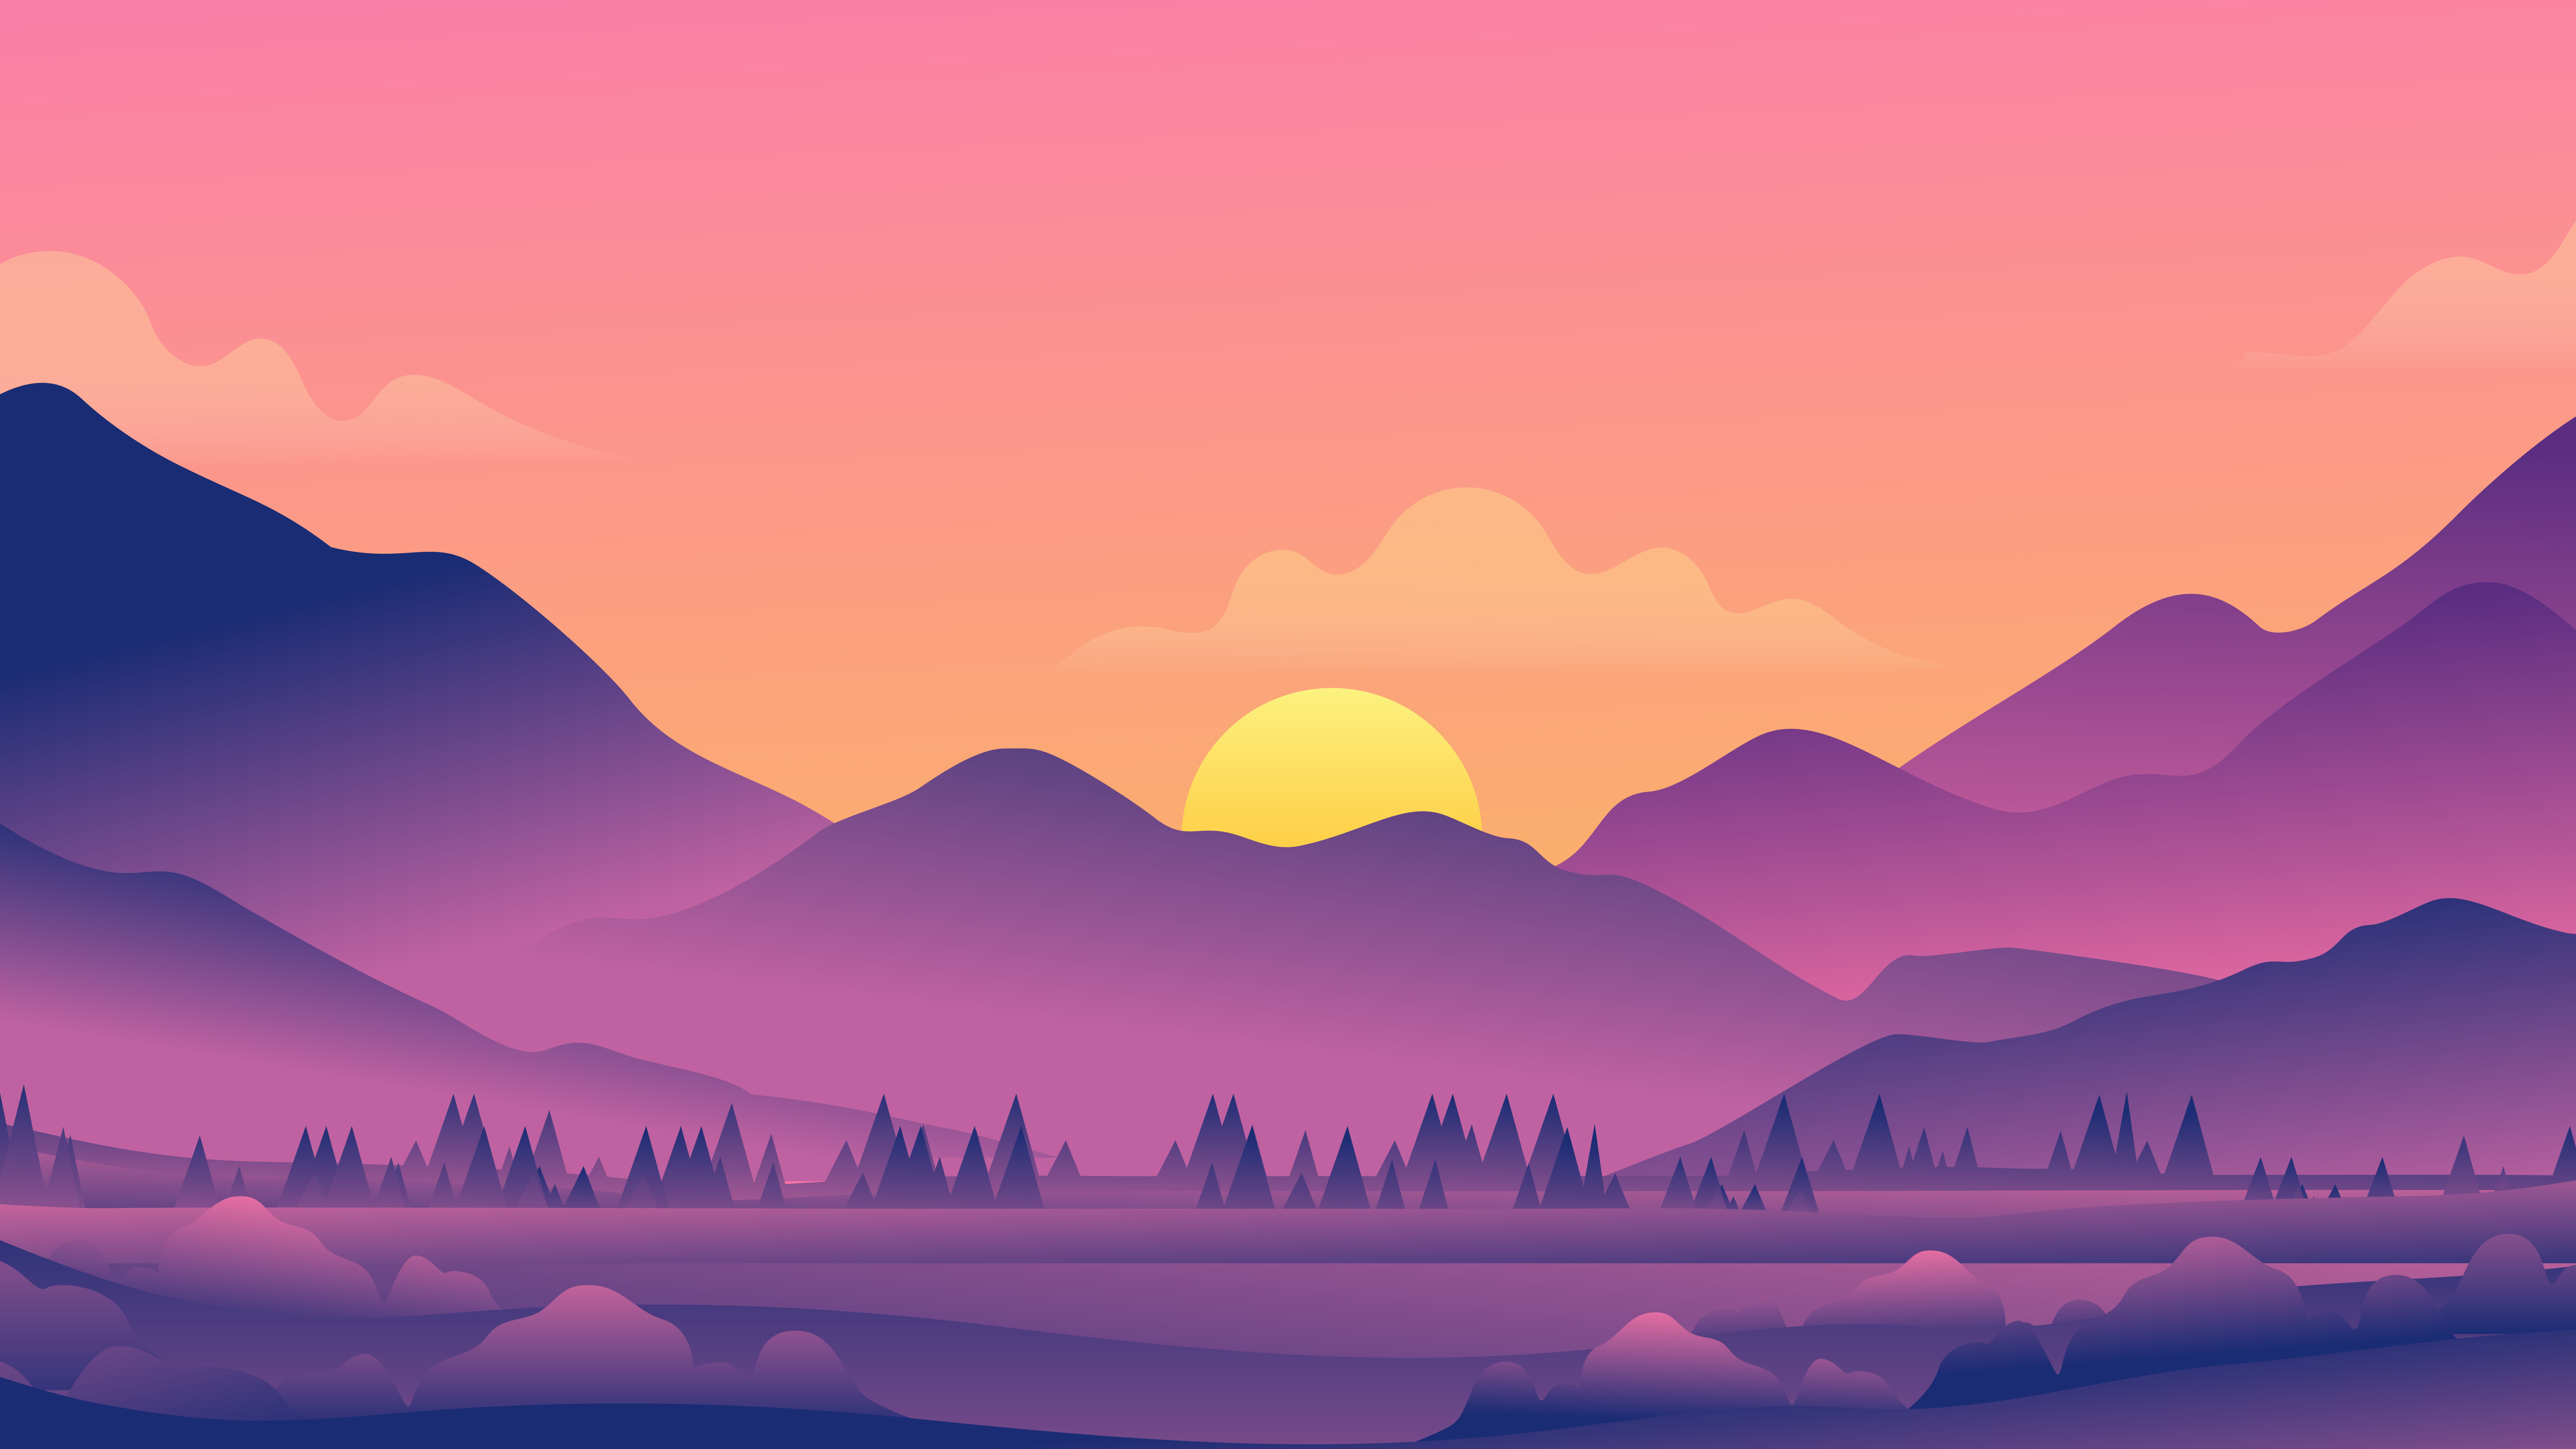 beautiful evening landscape minimal 4k 1608658977 - Beautiful Evening Landscape Minimal 4k - Beautiful Evening Landscape Minimal 4k wallpapers